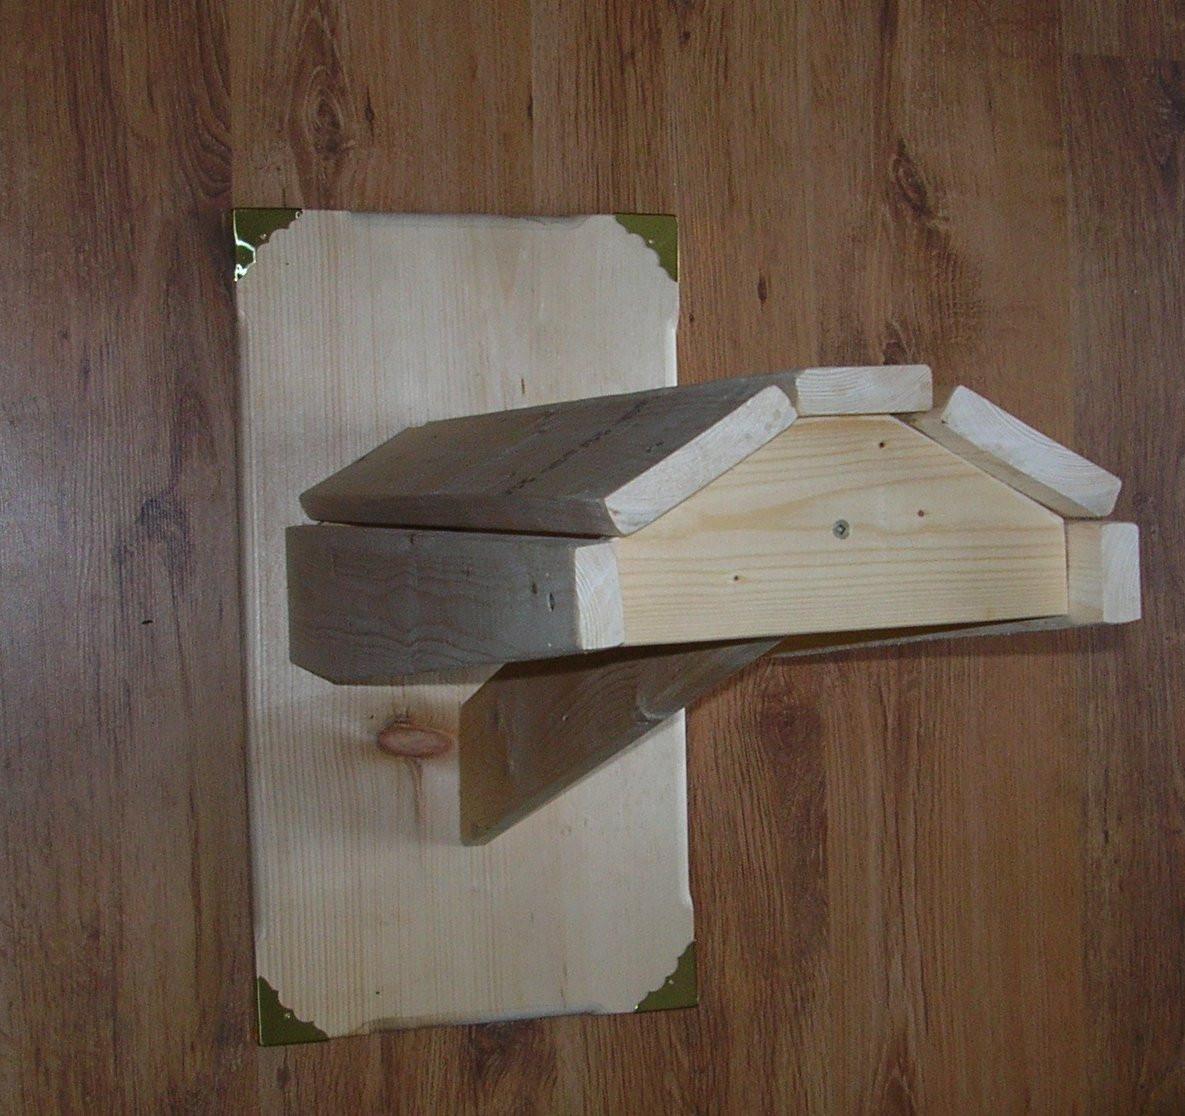 Best ideas about DIY Saddle Racks . Save or Pin Wall Saddle Rack Plans DIY Blueprint Plans Download Now.